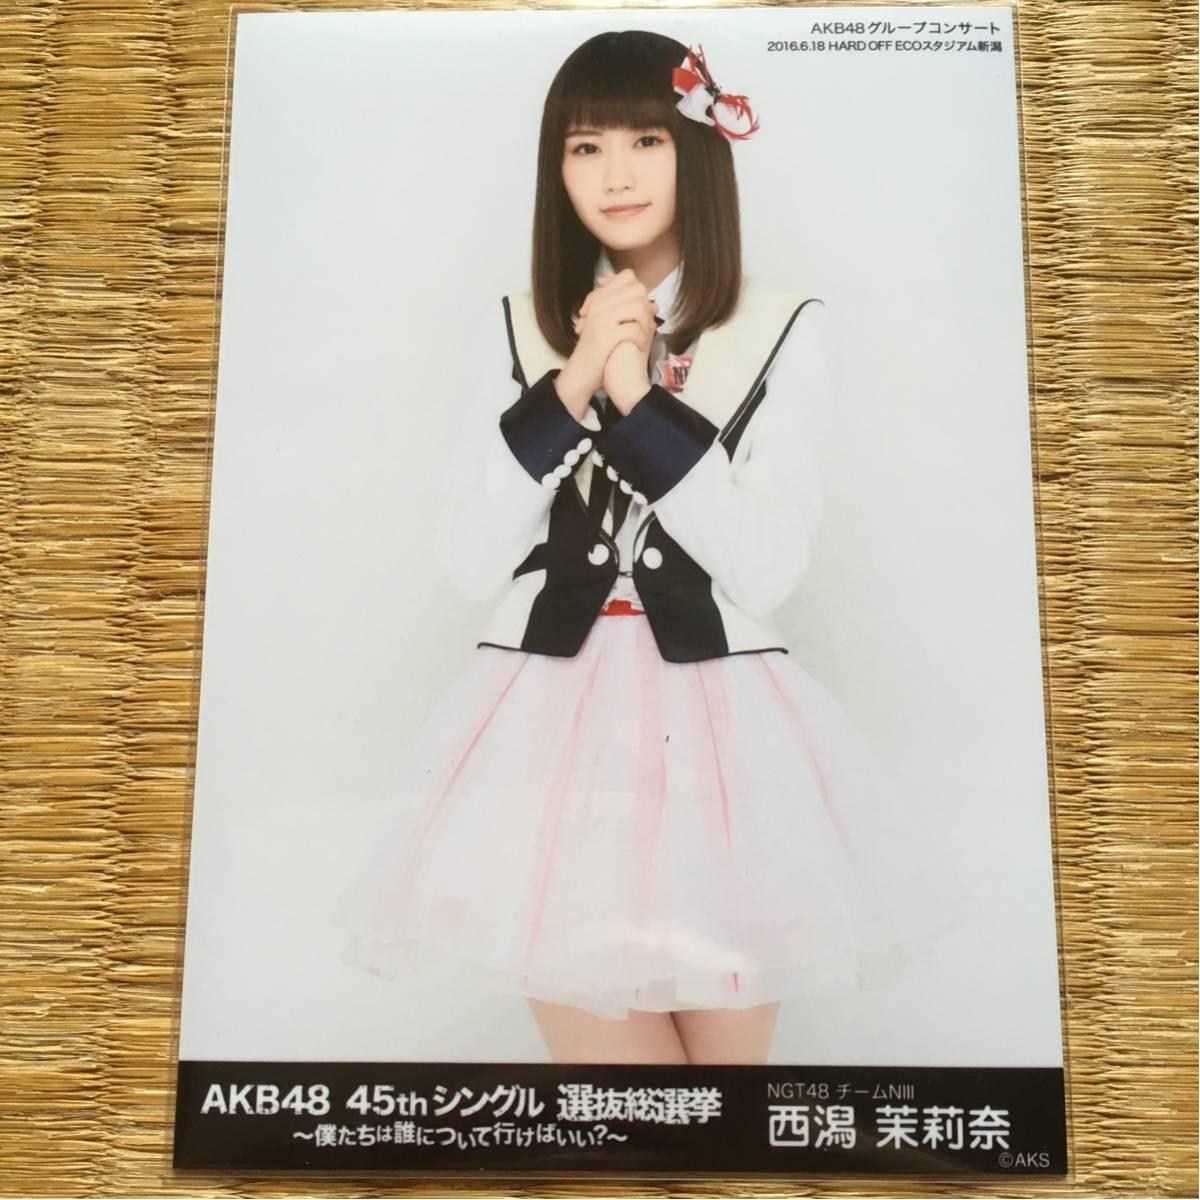 NGT48 西潟茉莉奈 生写真 AKB48 45thシングル選抜総選挙 AKB48グループコンサート(ブラック帯) ライブ・総選挙グッズの画像